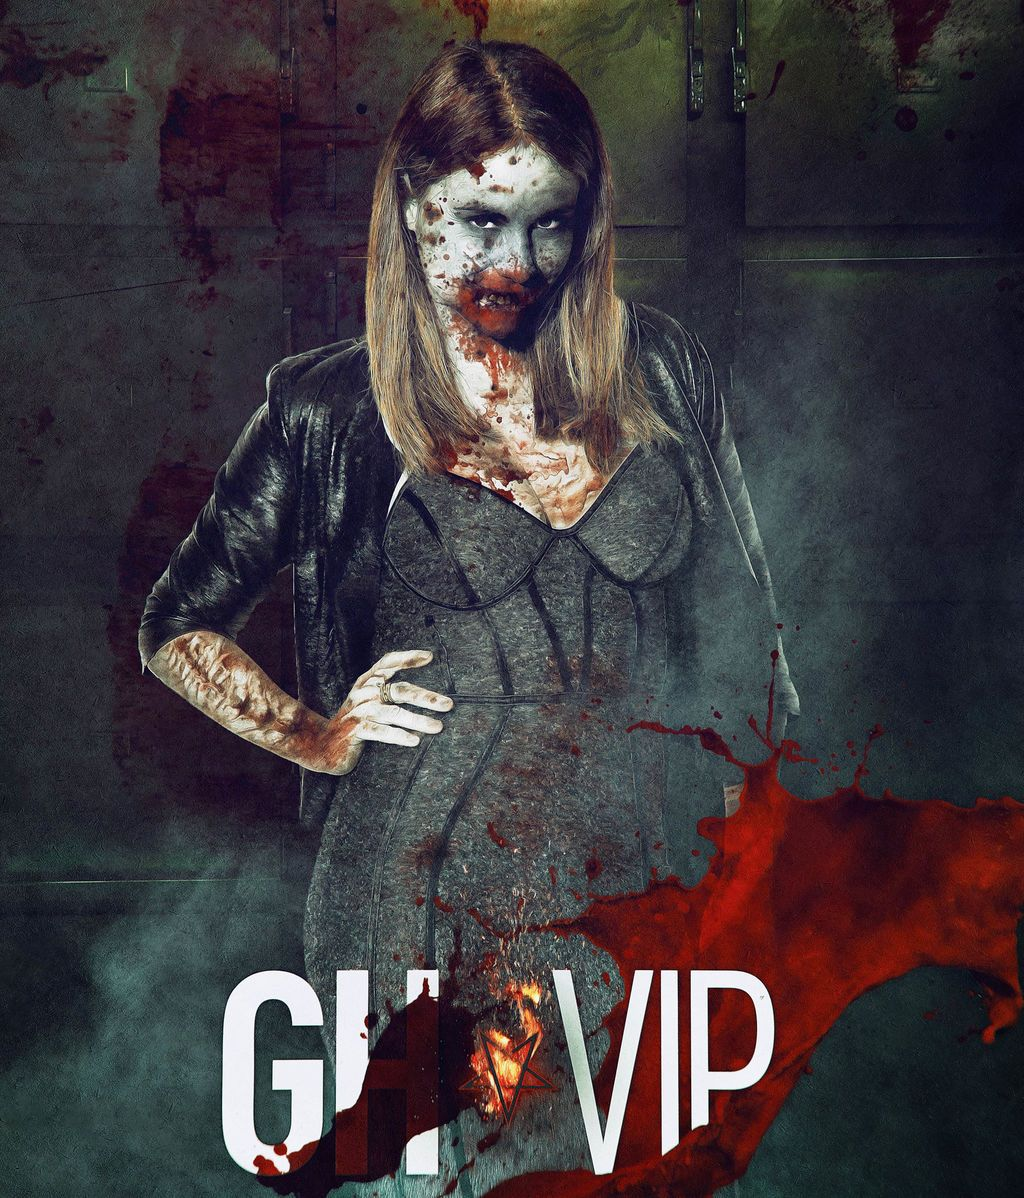 Noche de Halloween en 'GH VIP'